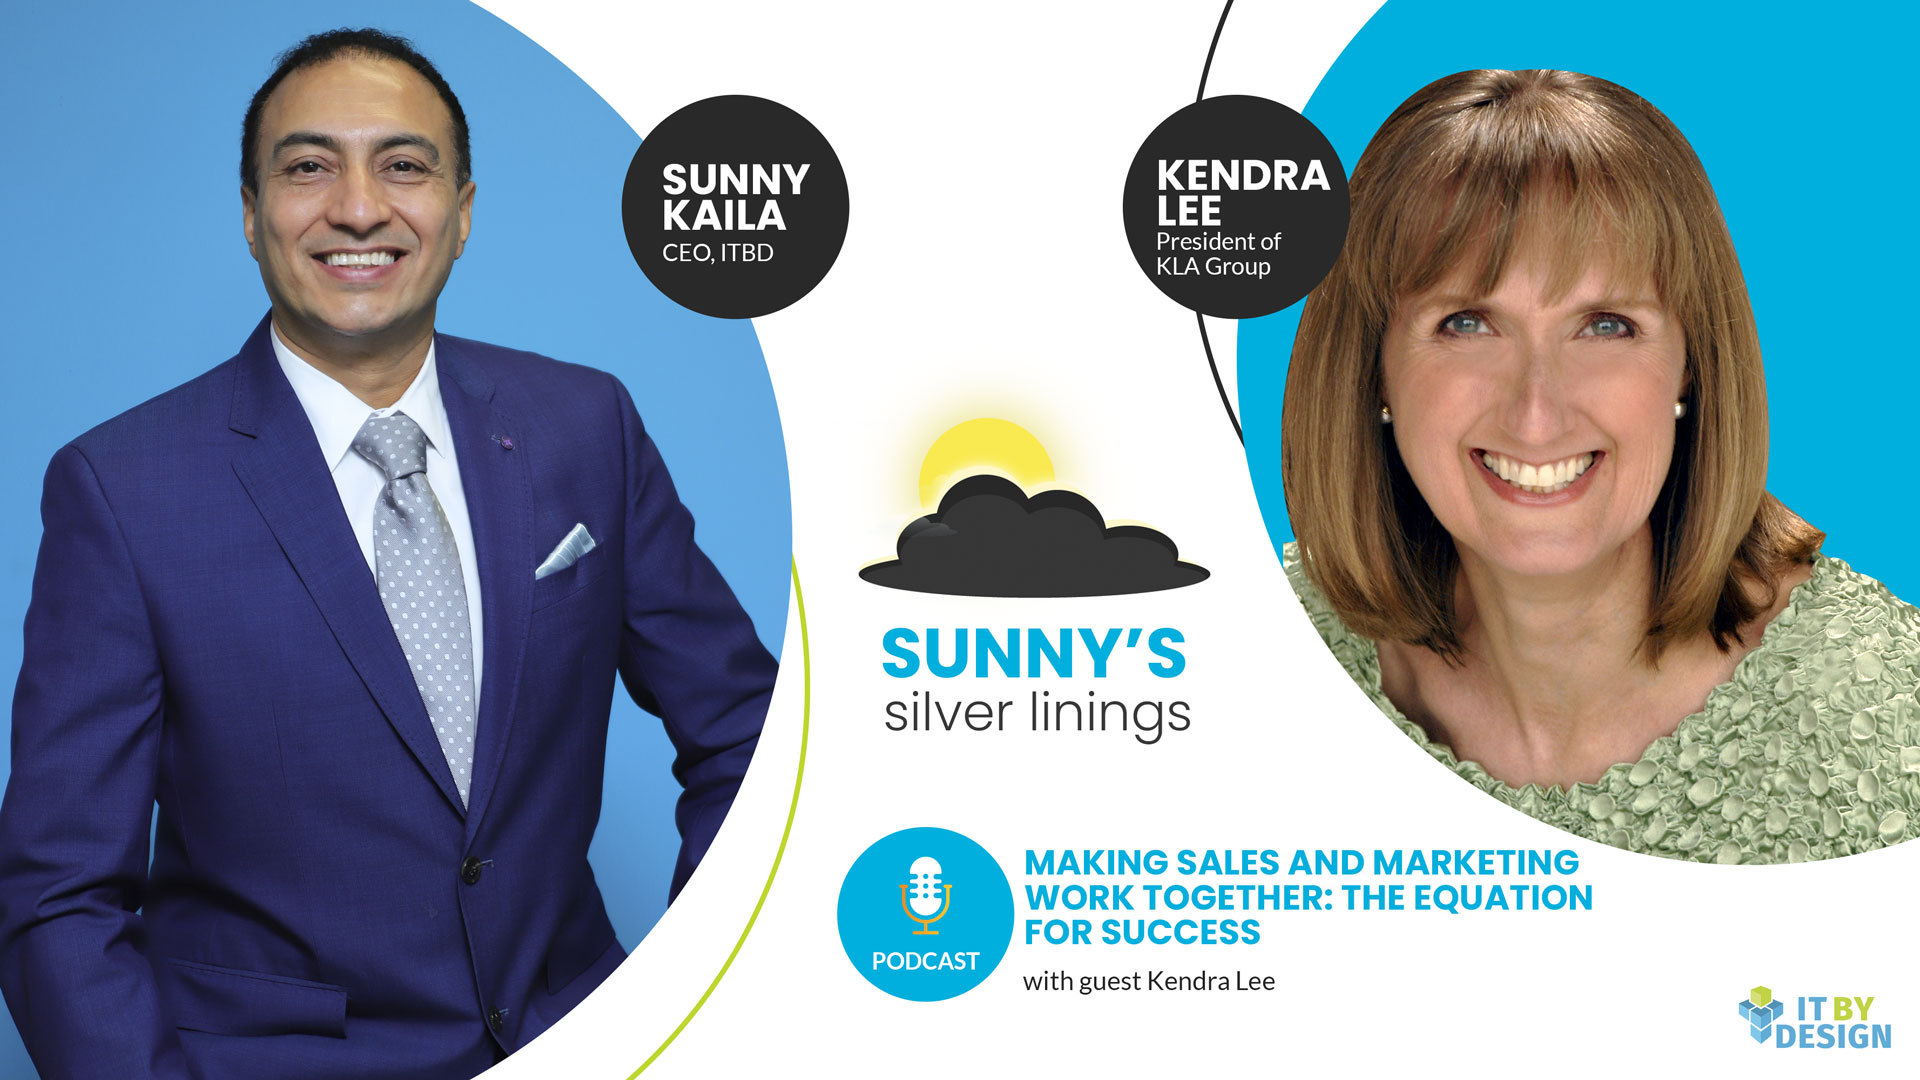 Making sales and marketing work together - Podcast title slide